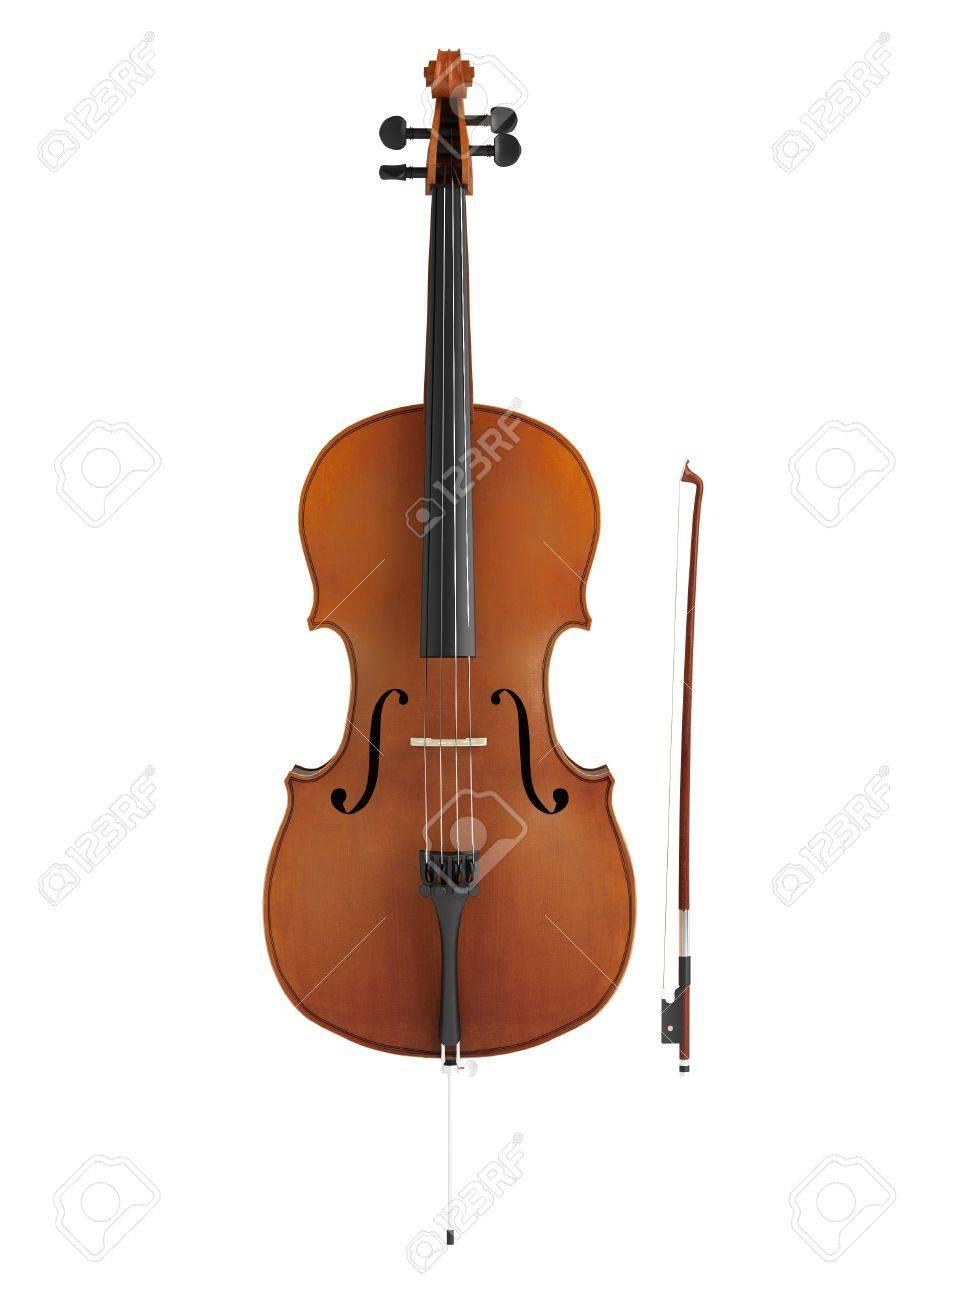 Cello isolated on white background Stock Photo - 9579492